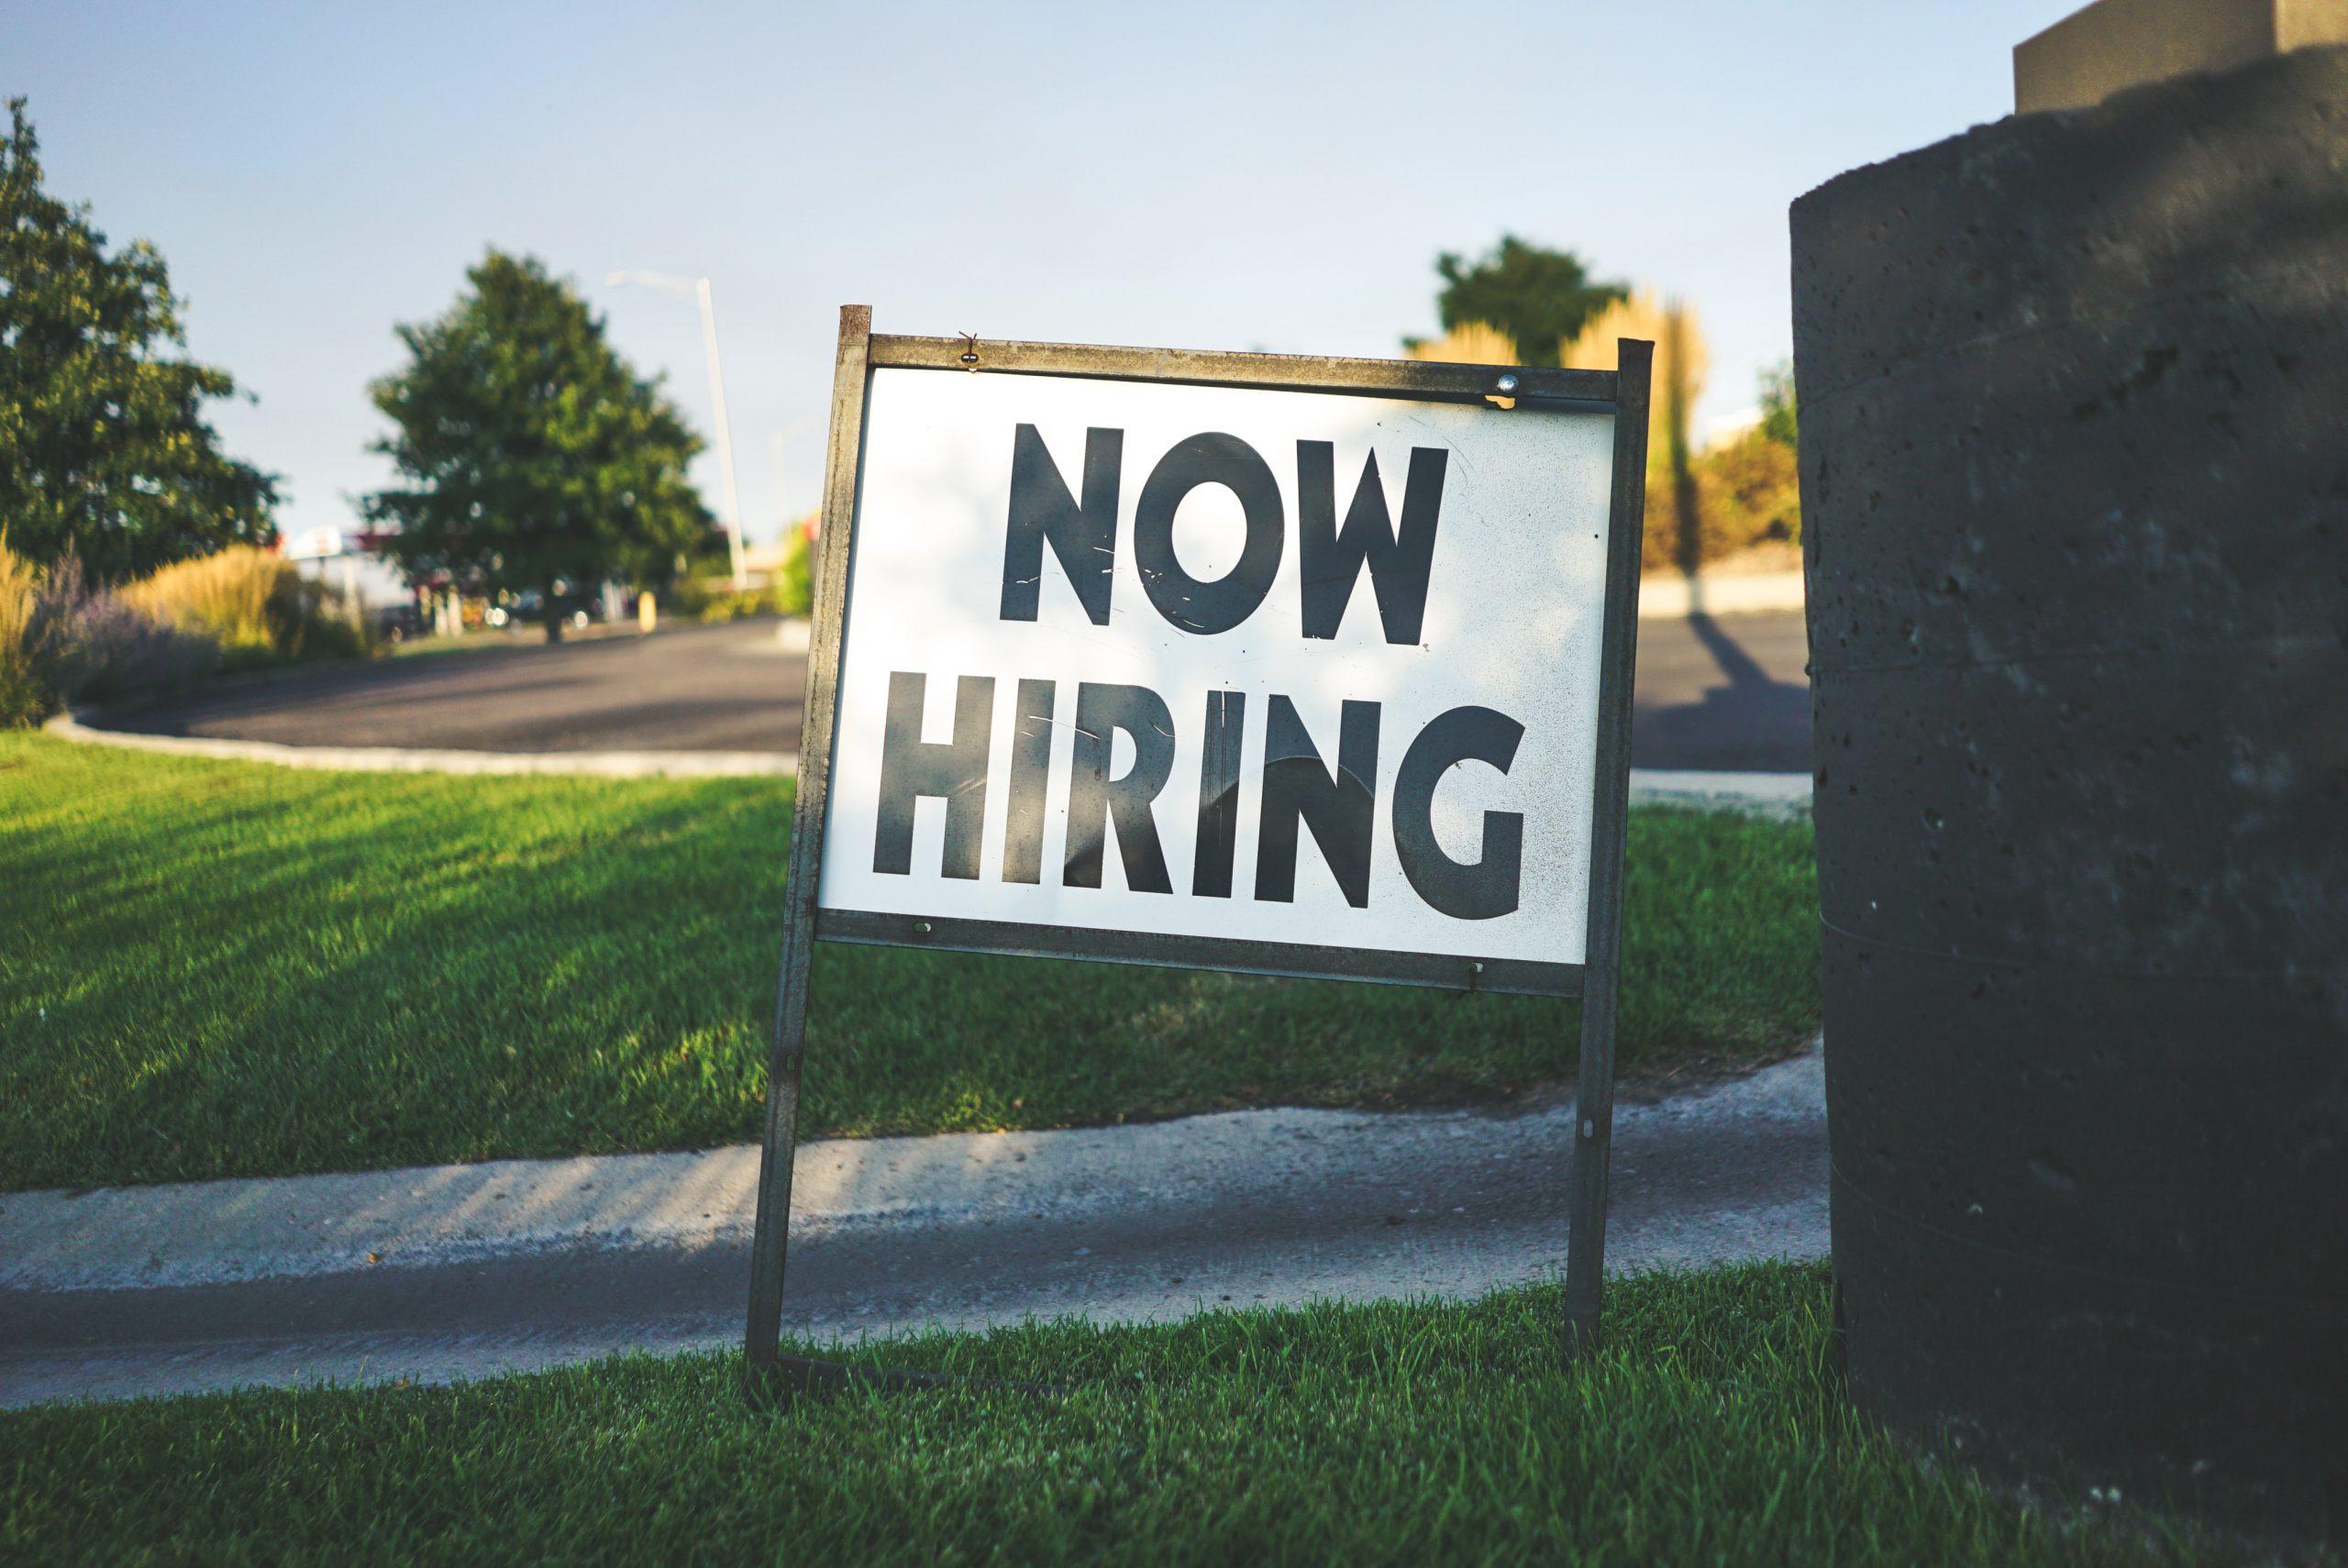 Job Market is Gradually Starting to Improve